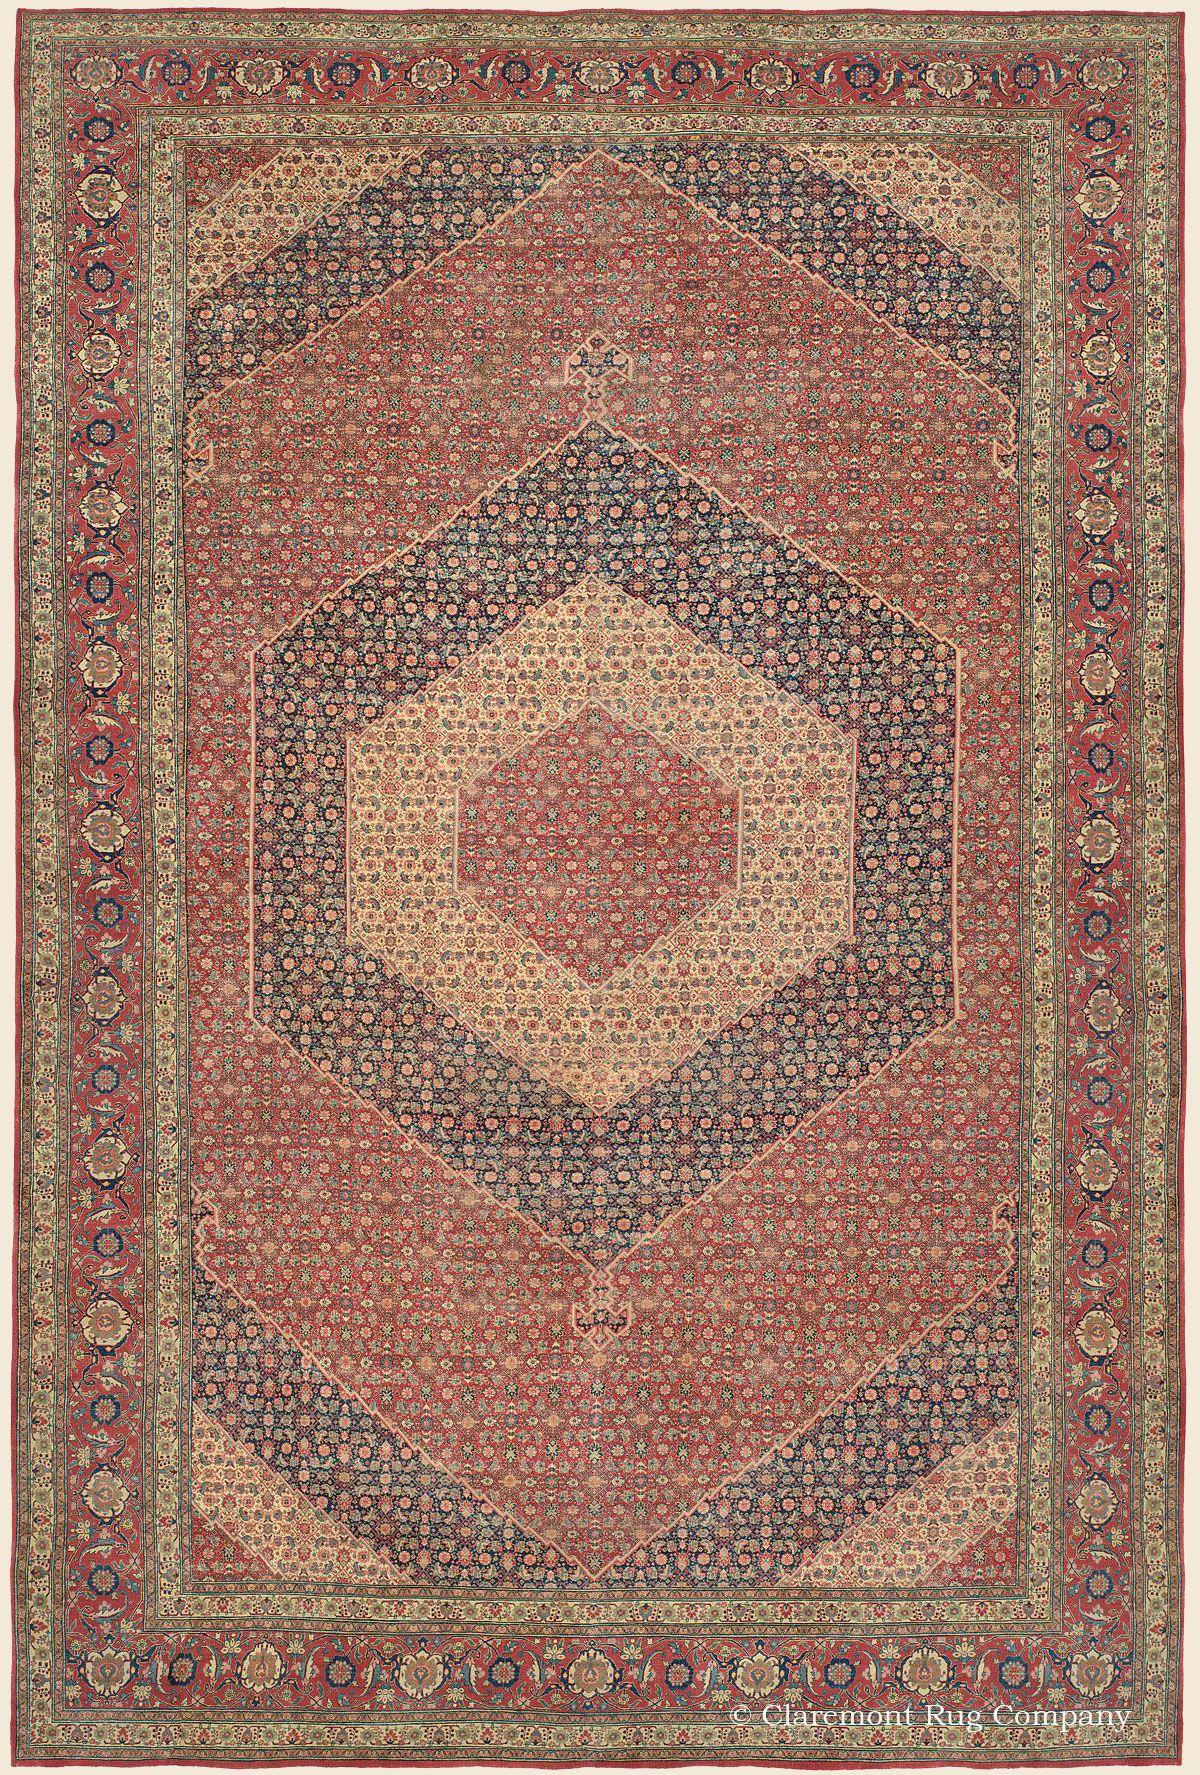 Hadji Jallili Haji Jalili Tabriz 12 8 X 19 1 Late 19th Century Northwest Persian Antique Rug Clarem Claremont Rug Company Persian Carpet Tabriz Rug